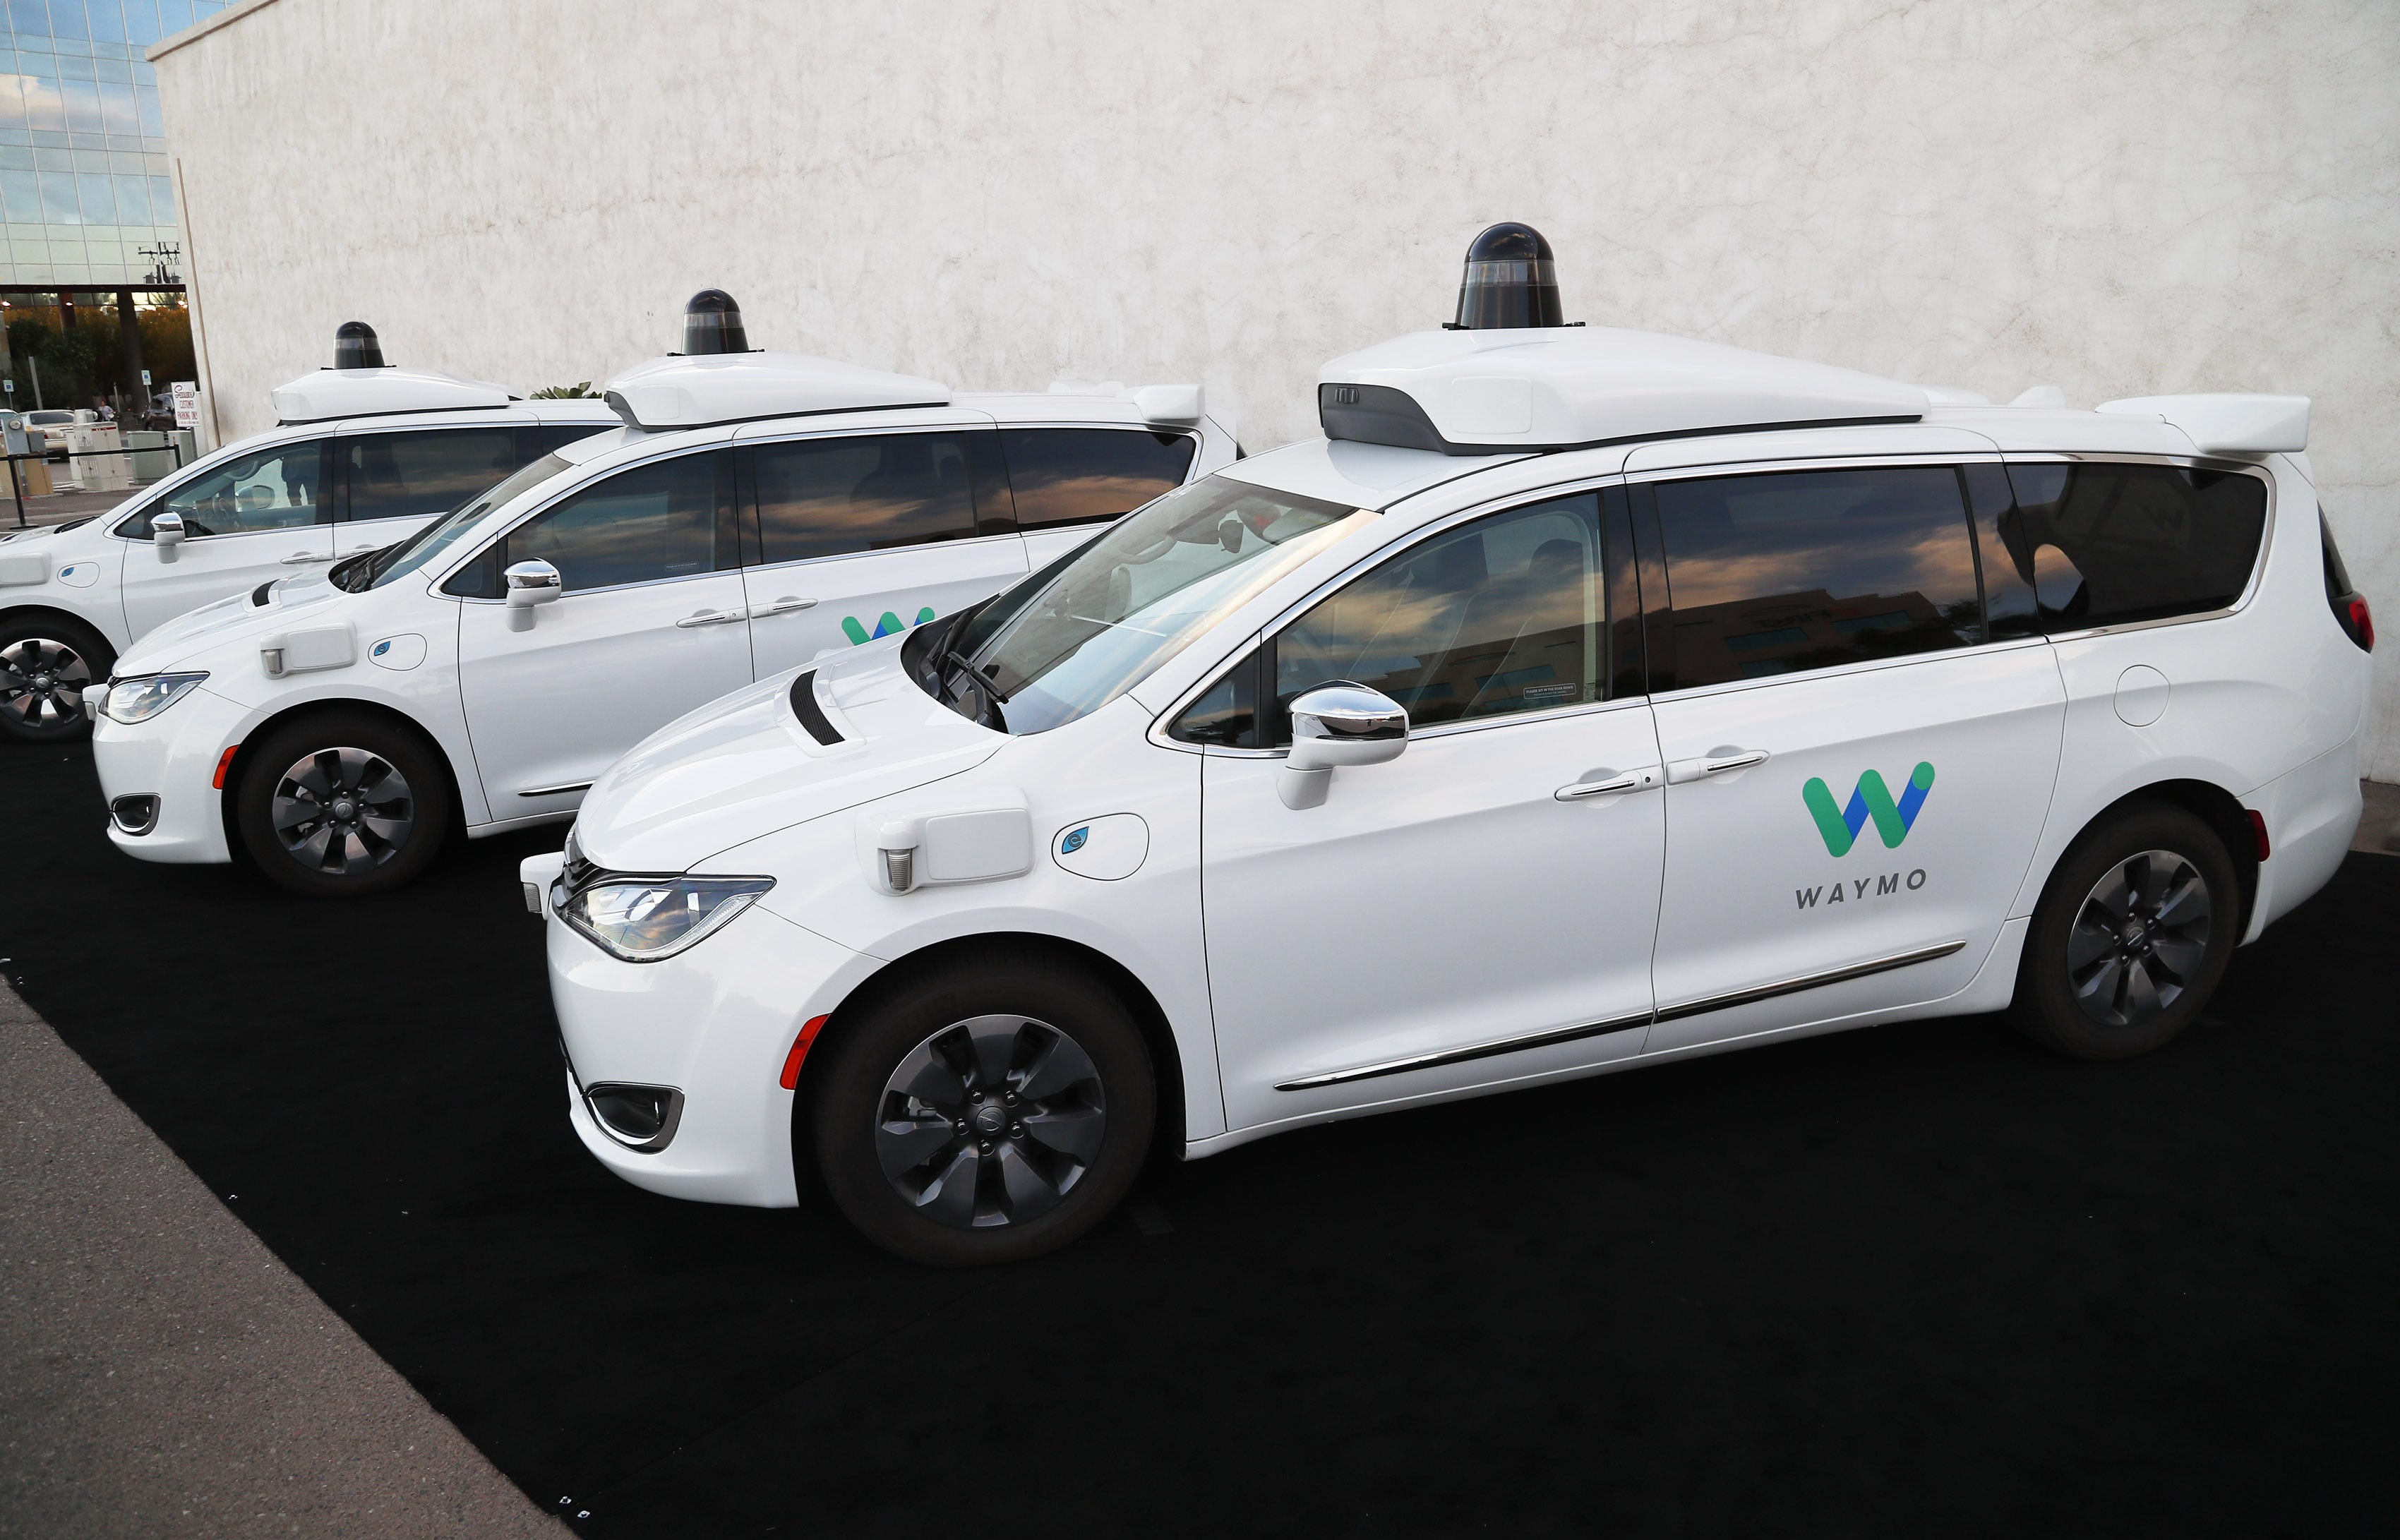 Phoenix Waymo vans: How the self-driving cars operate on roads